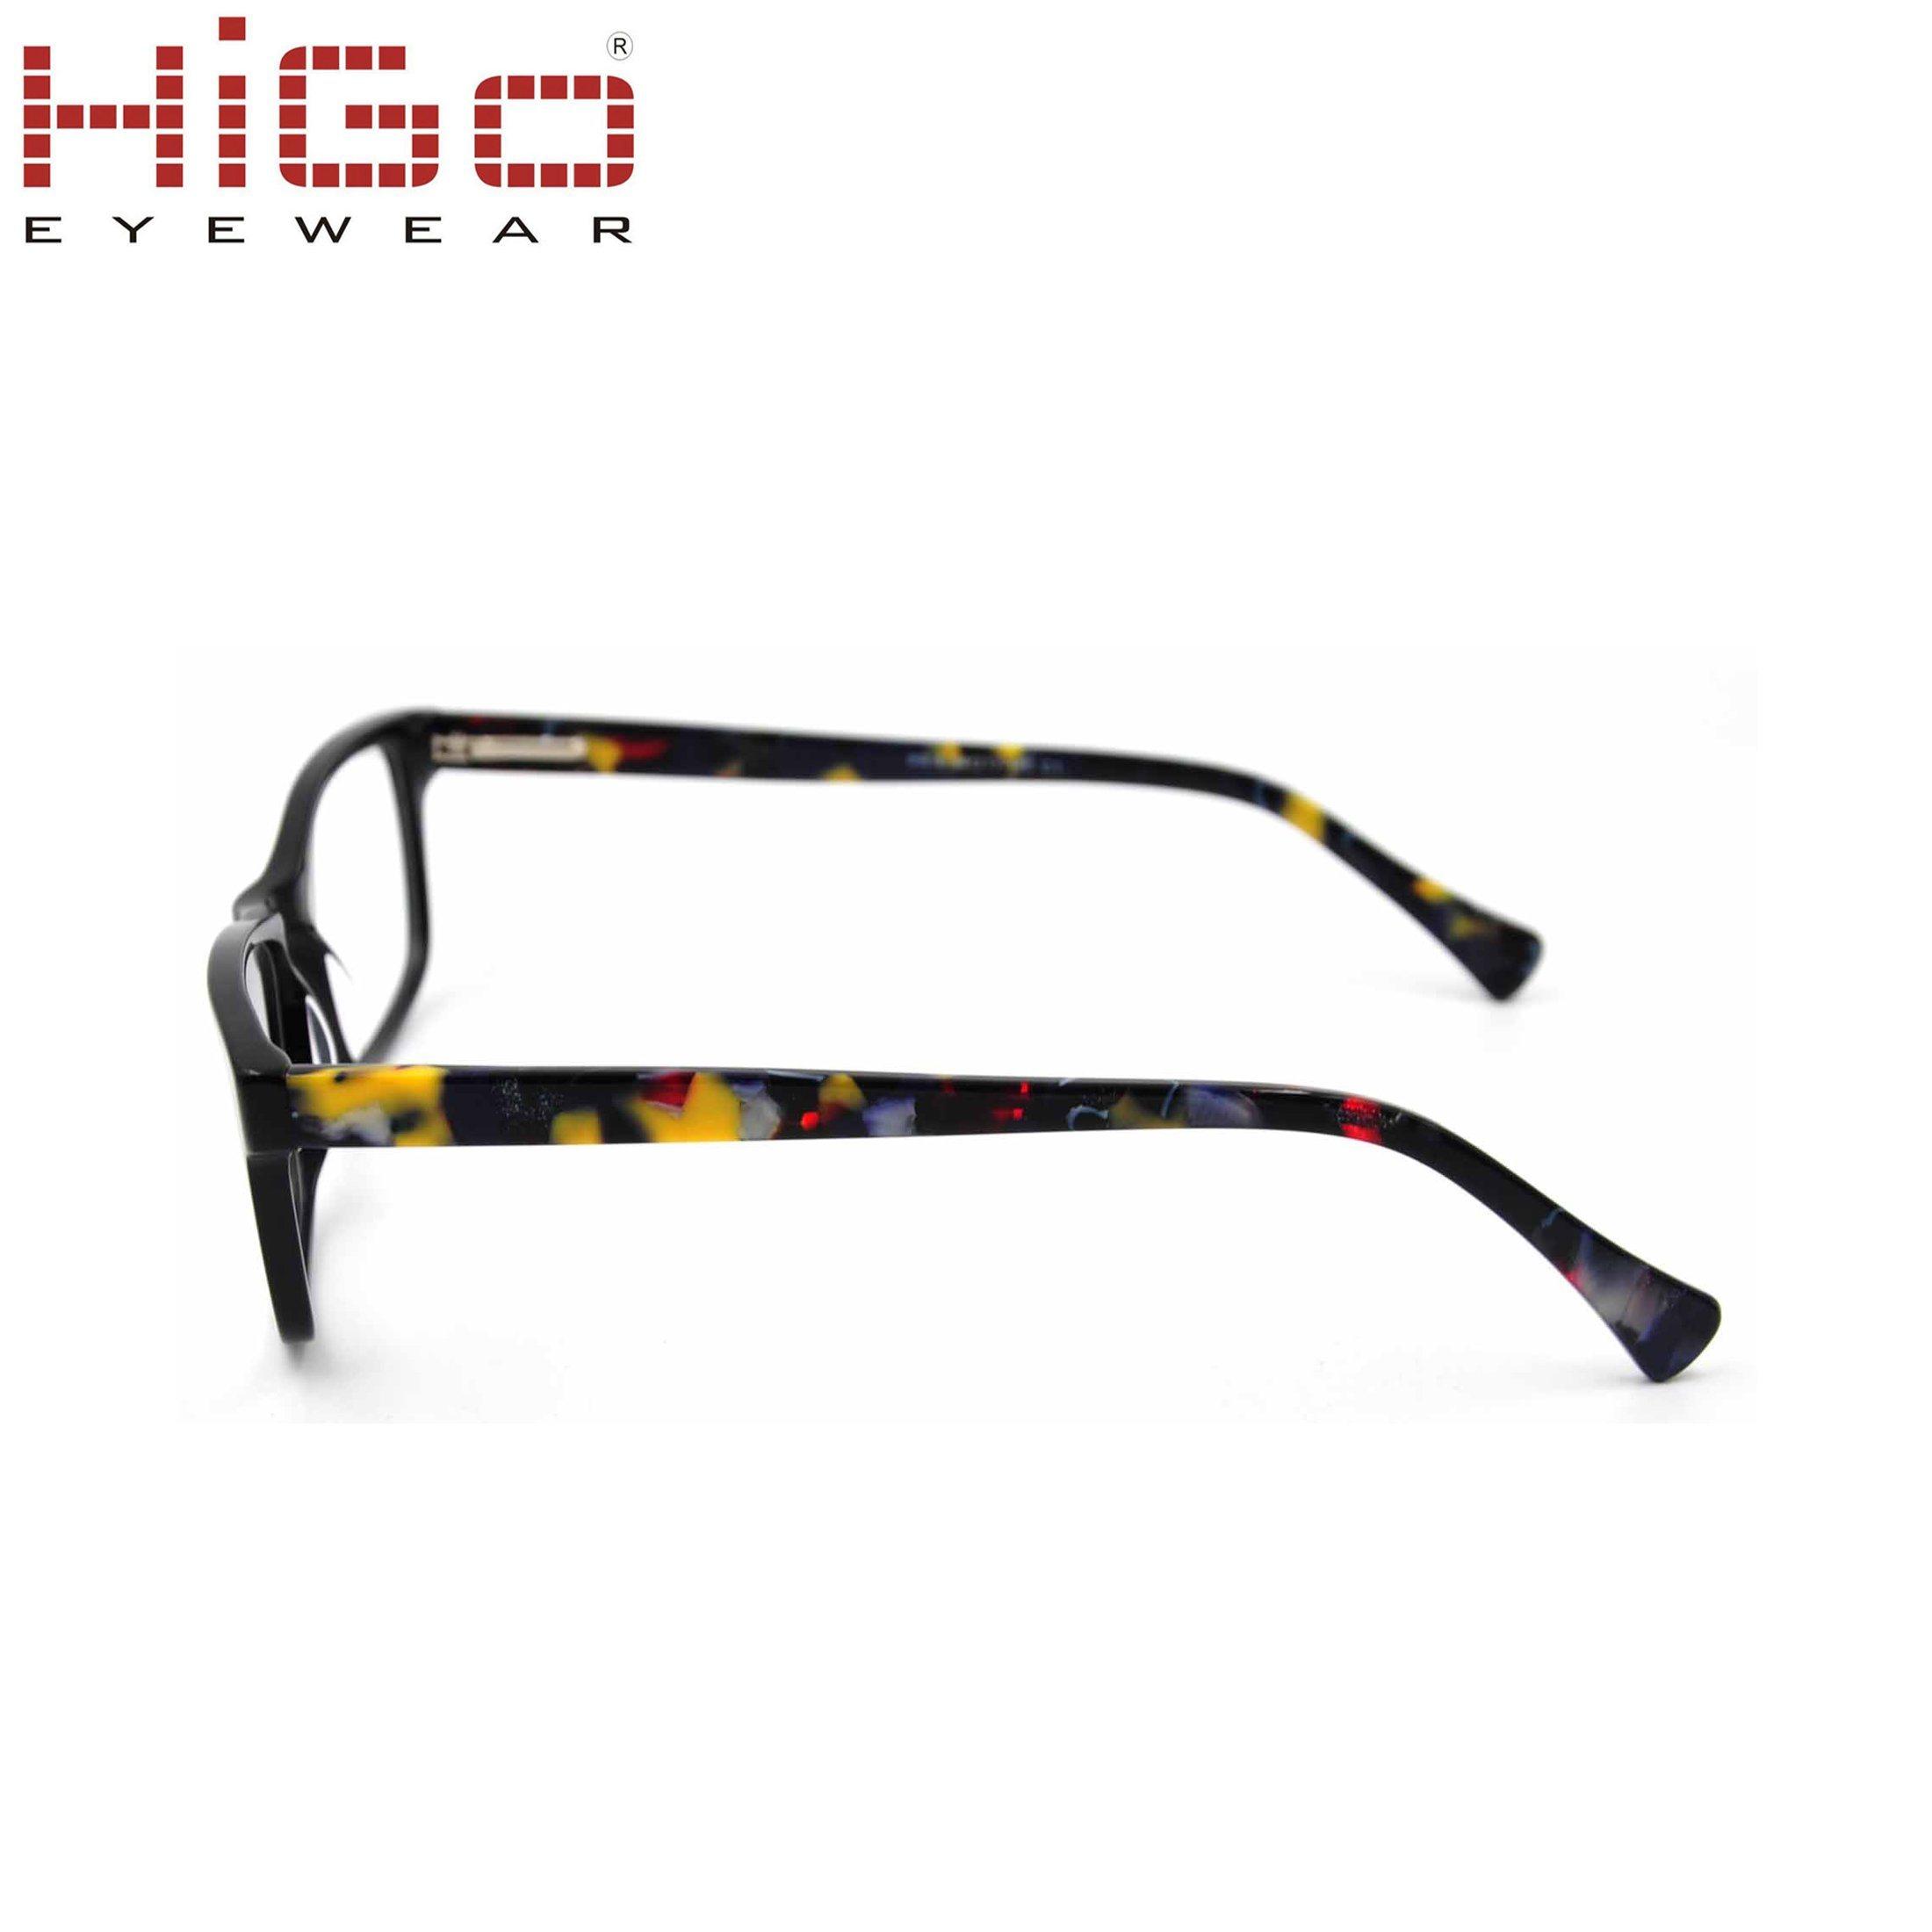 e13aea8071 China 2018 Round Cheap Acetate Optical Frame Eyeglasses Eyewear ...